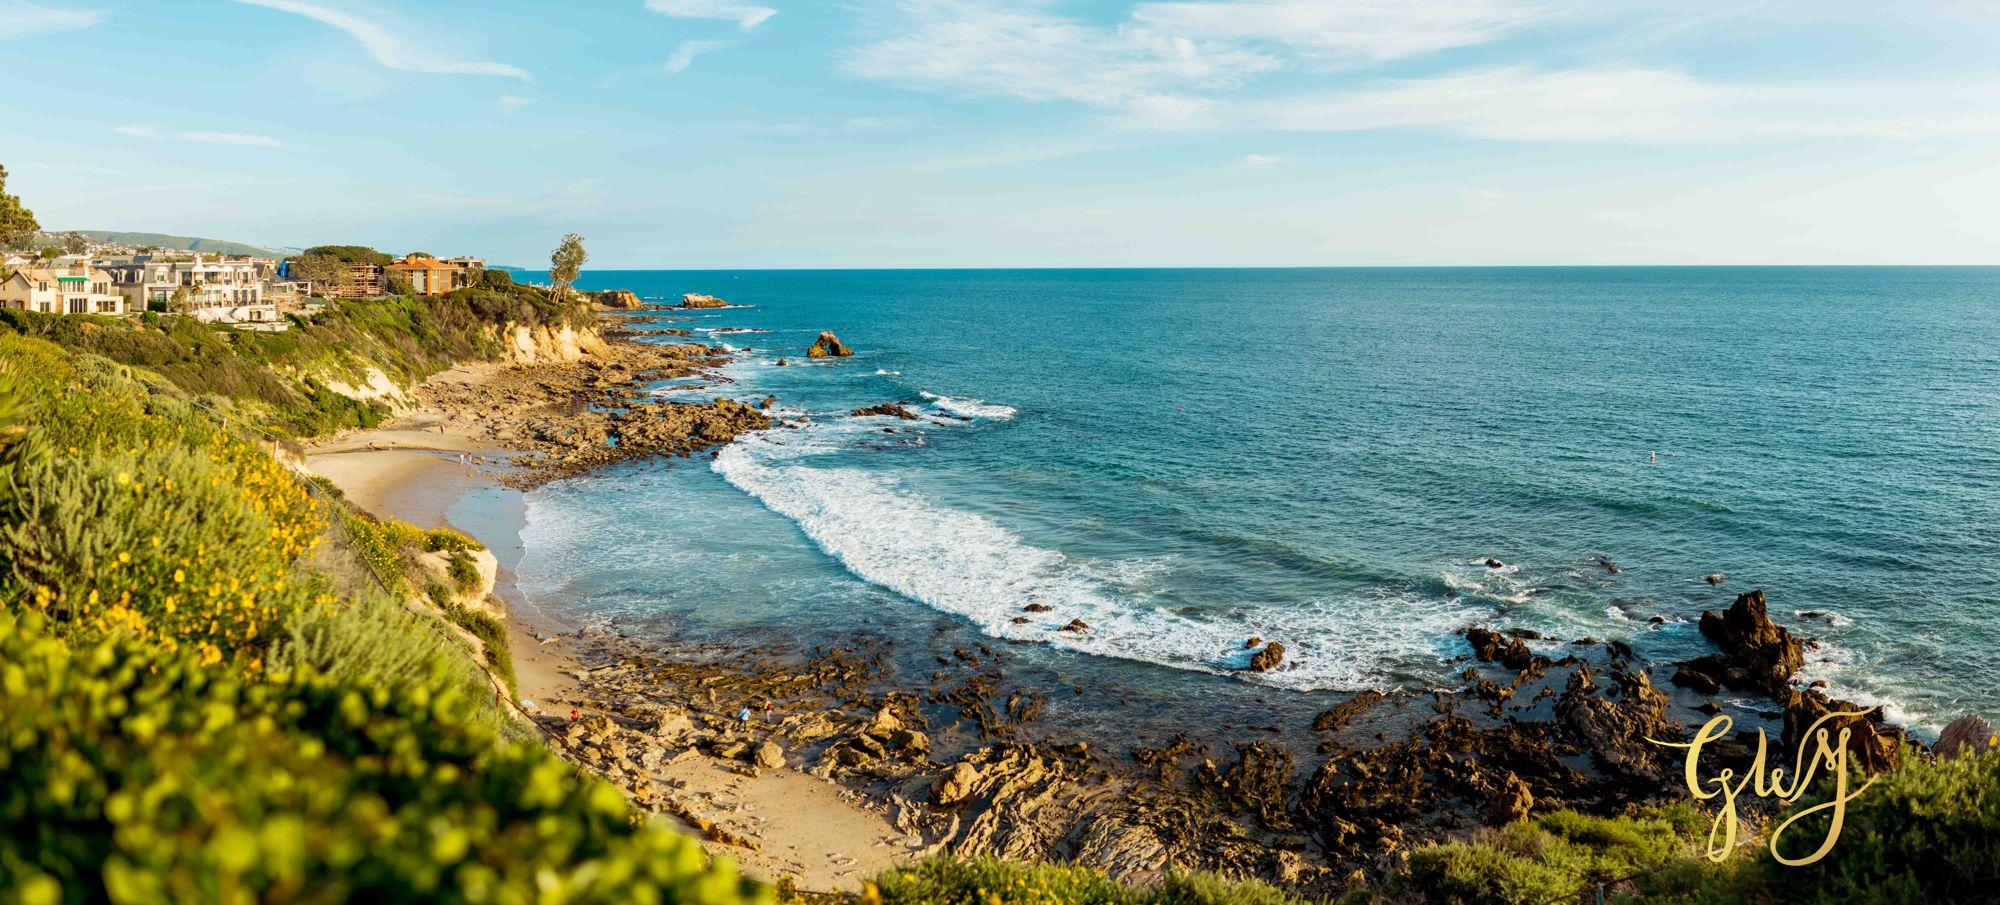 Ashley + Brandt California Super Bloom and Little Corona Del Mar Beach Engagement by Glass Woods Media 9.jpg